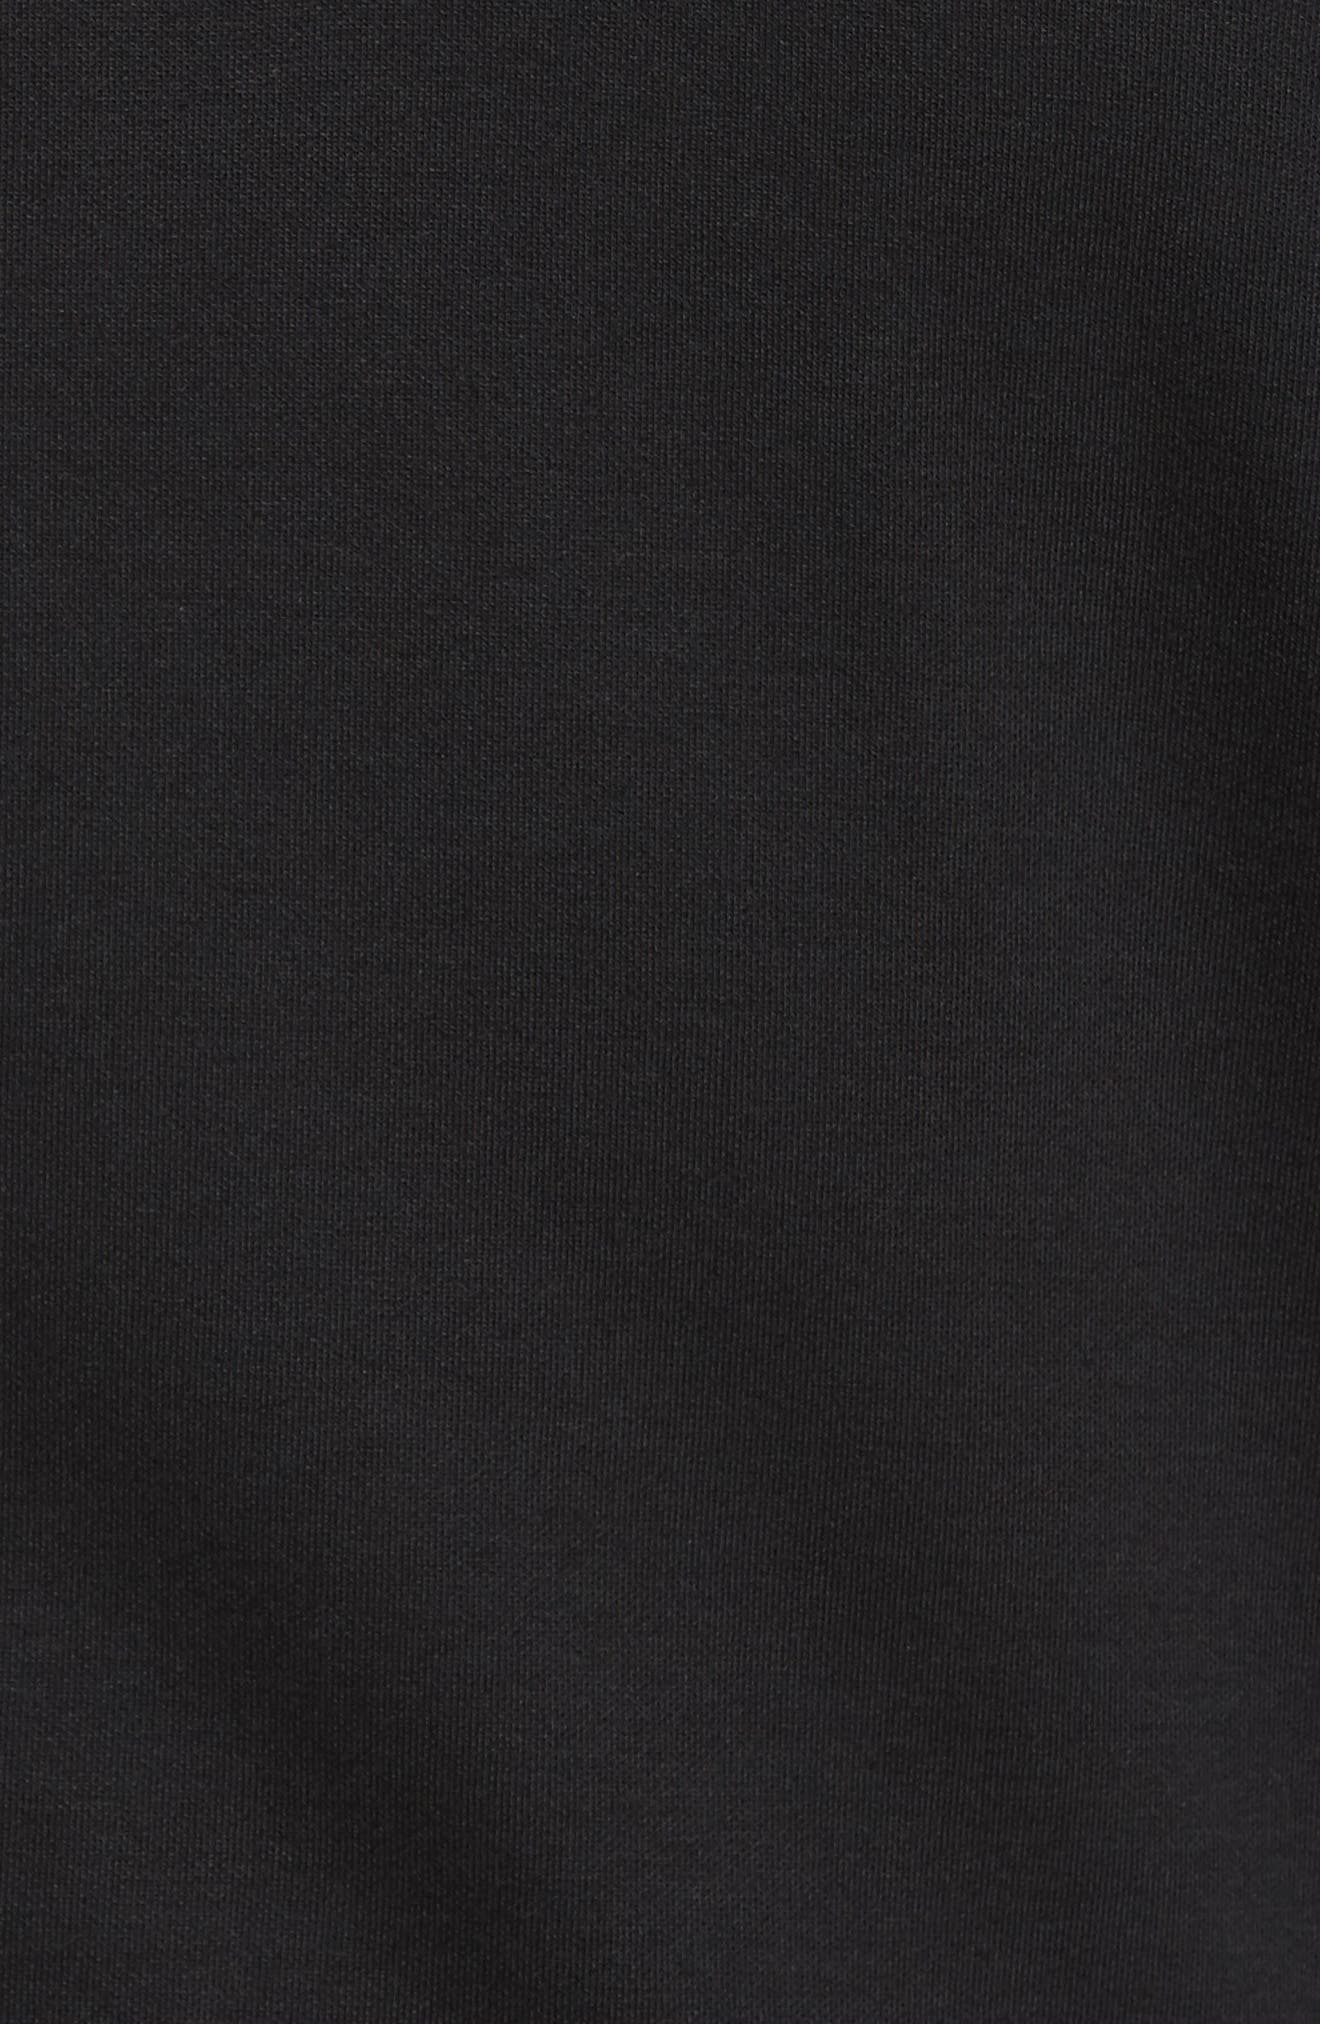 Sully Quarter Zip Pullover,                             Alternate thumbnail 5, color,                             BLACK